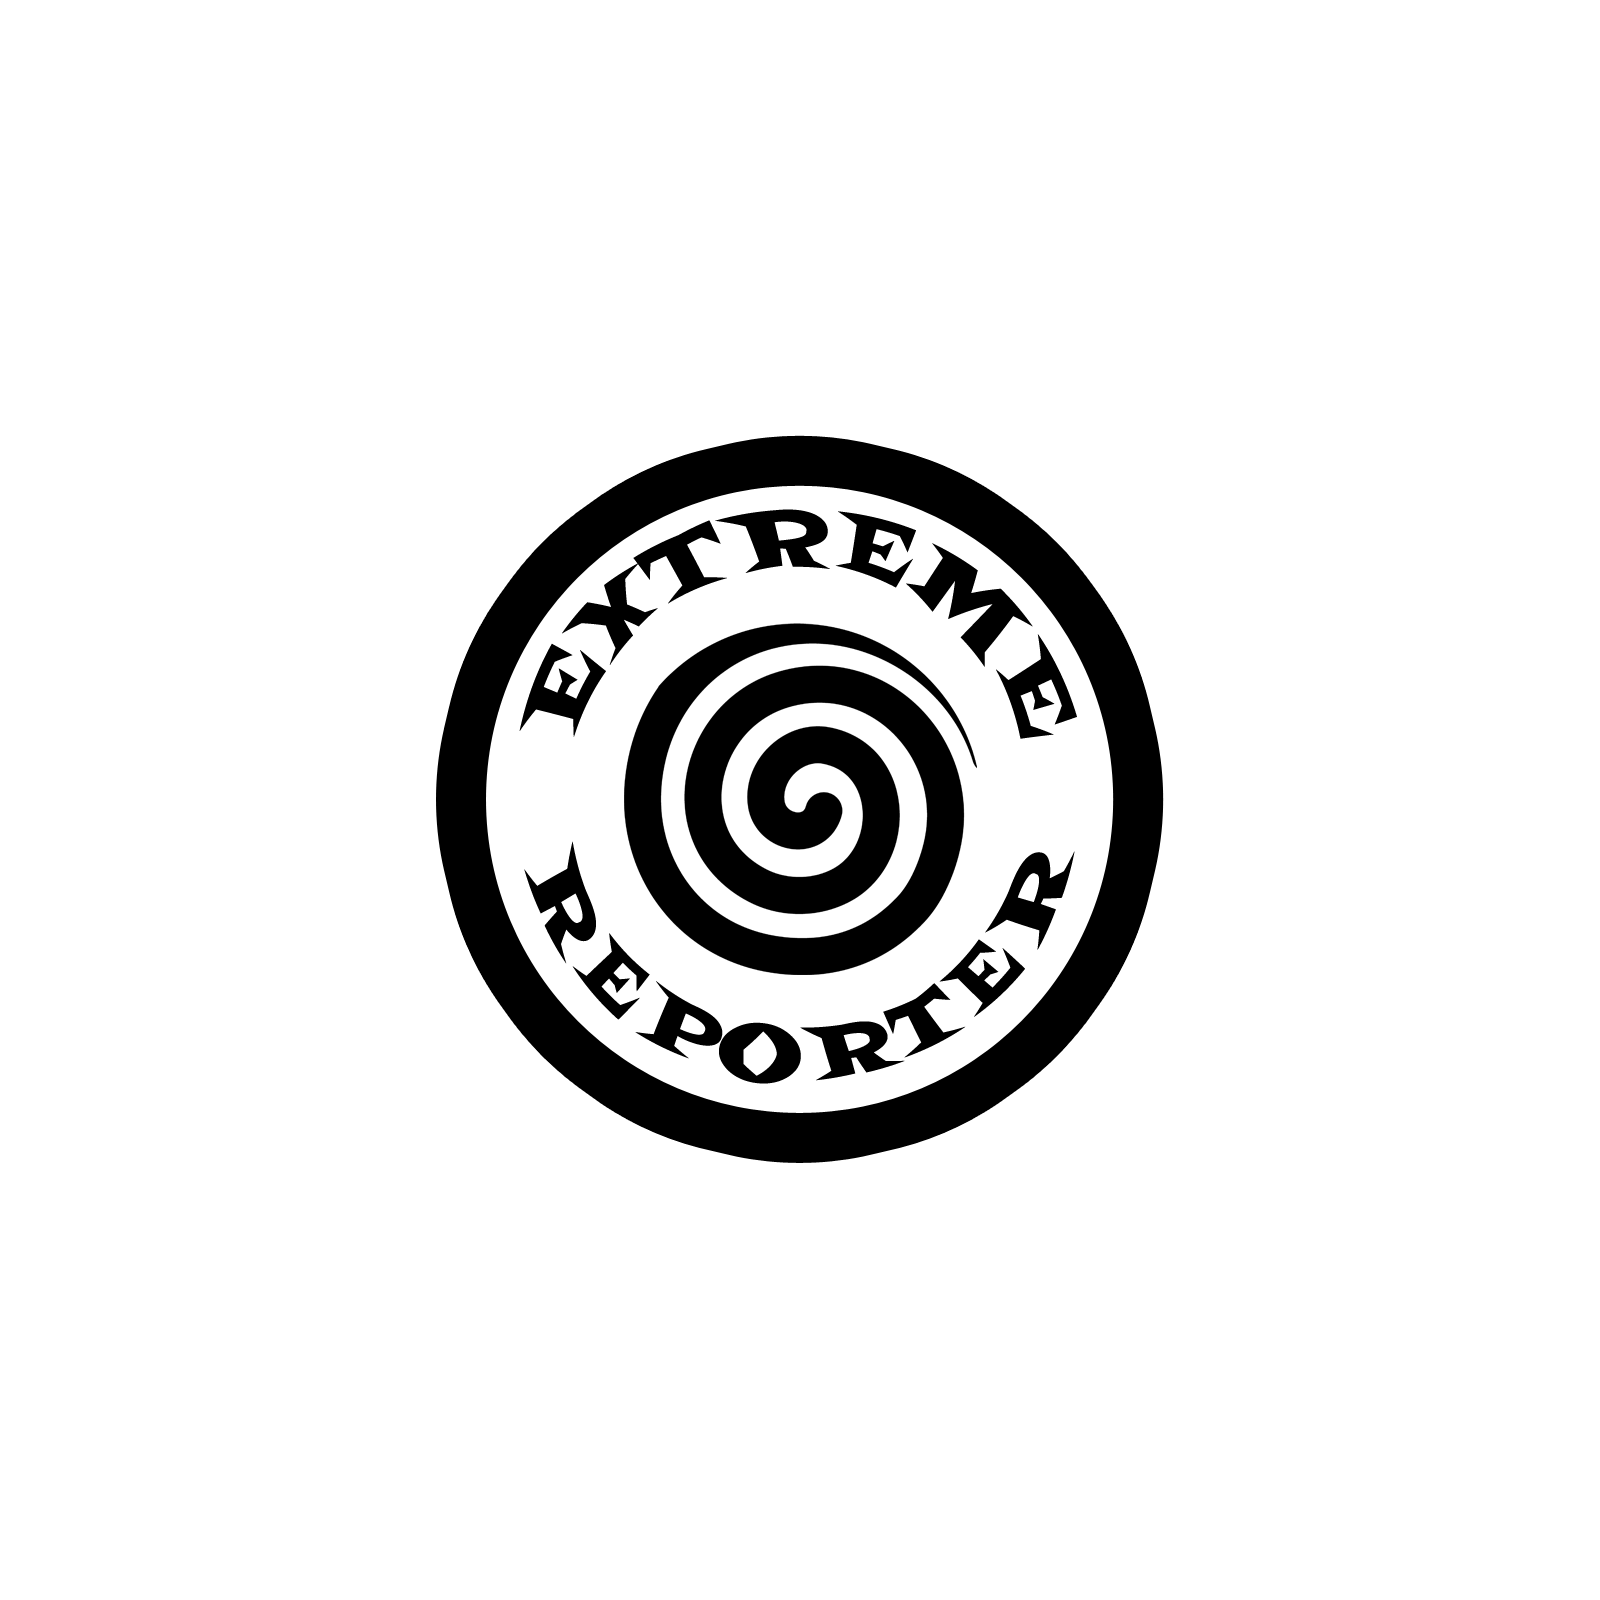 Логотип для экстрим фотографа.  фото f_9115a526e8f6ff7c.png